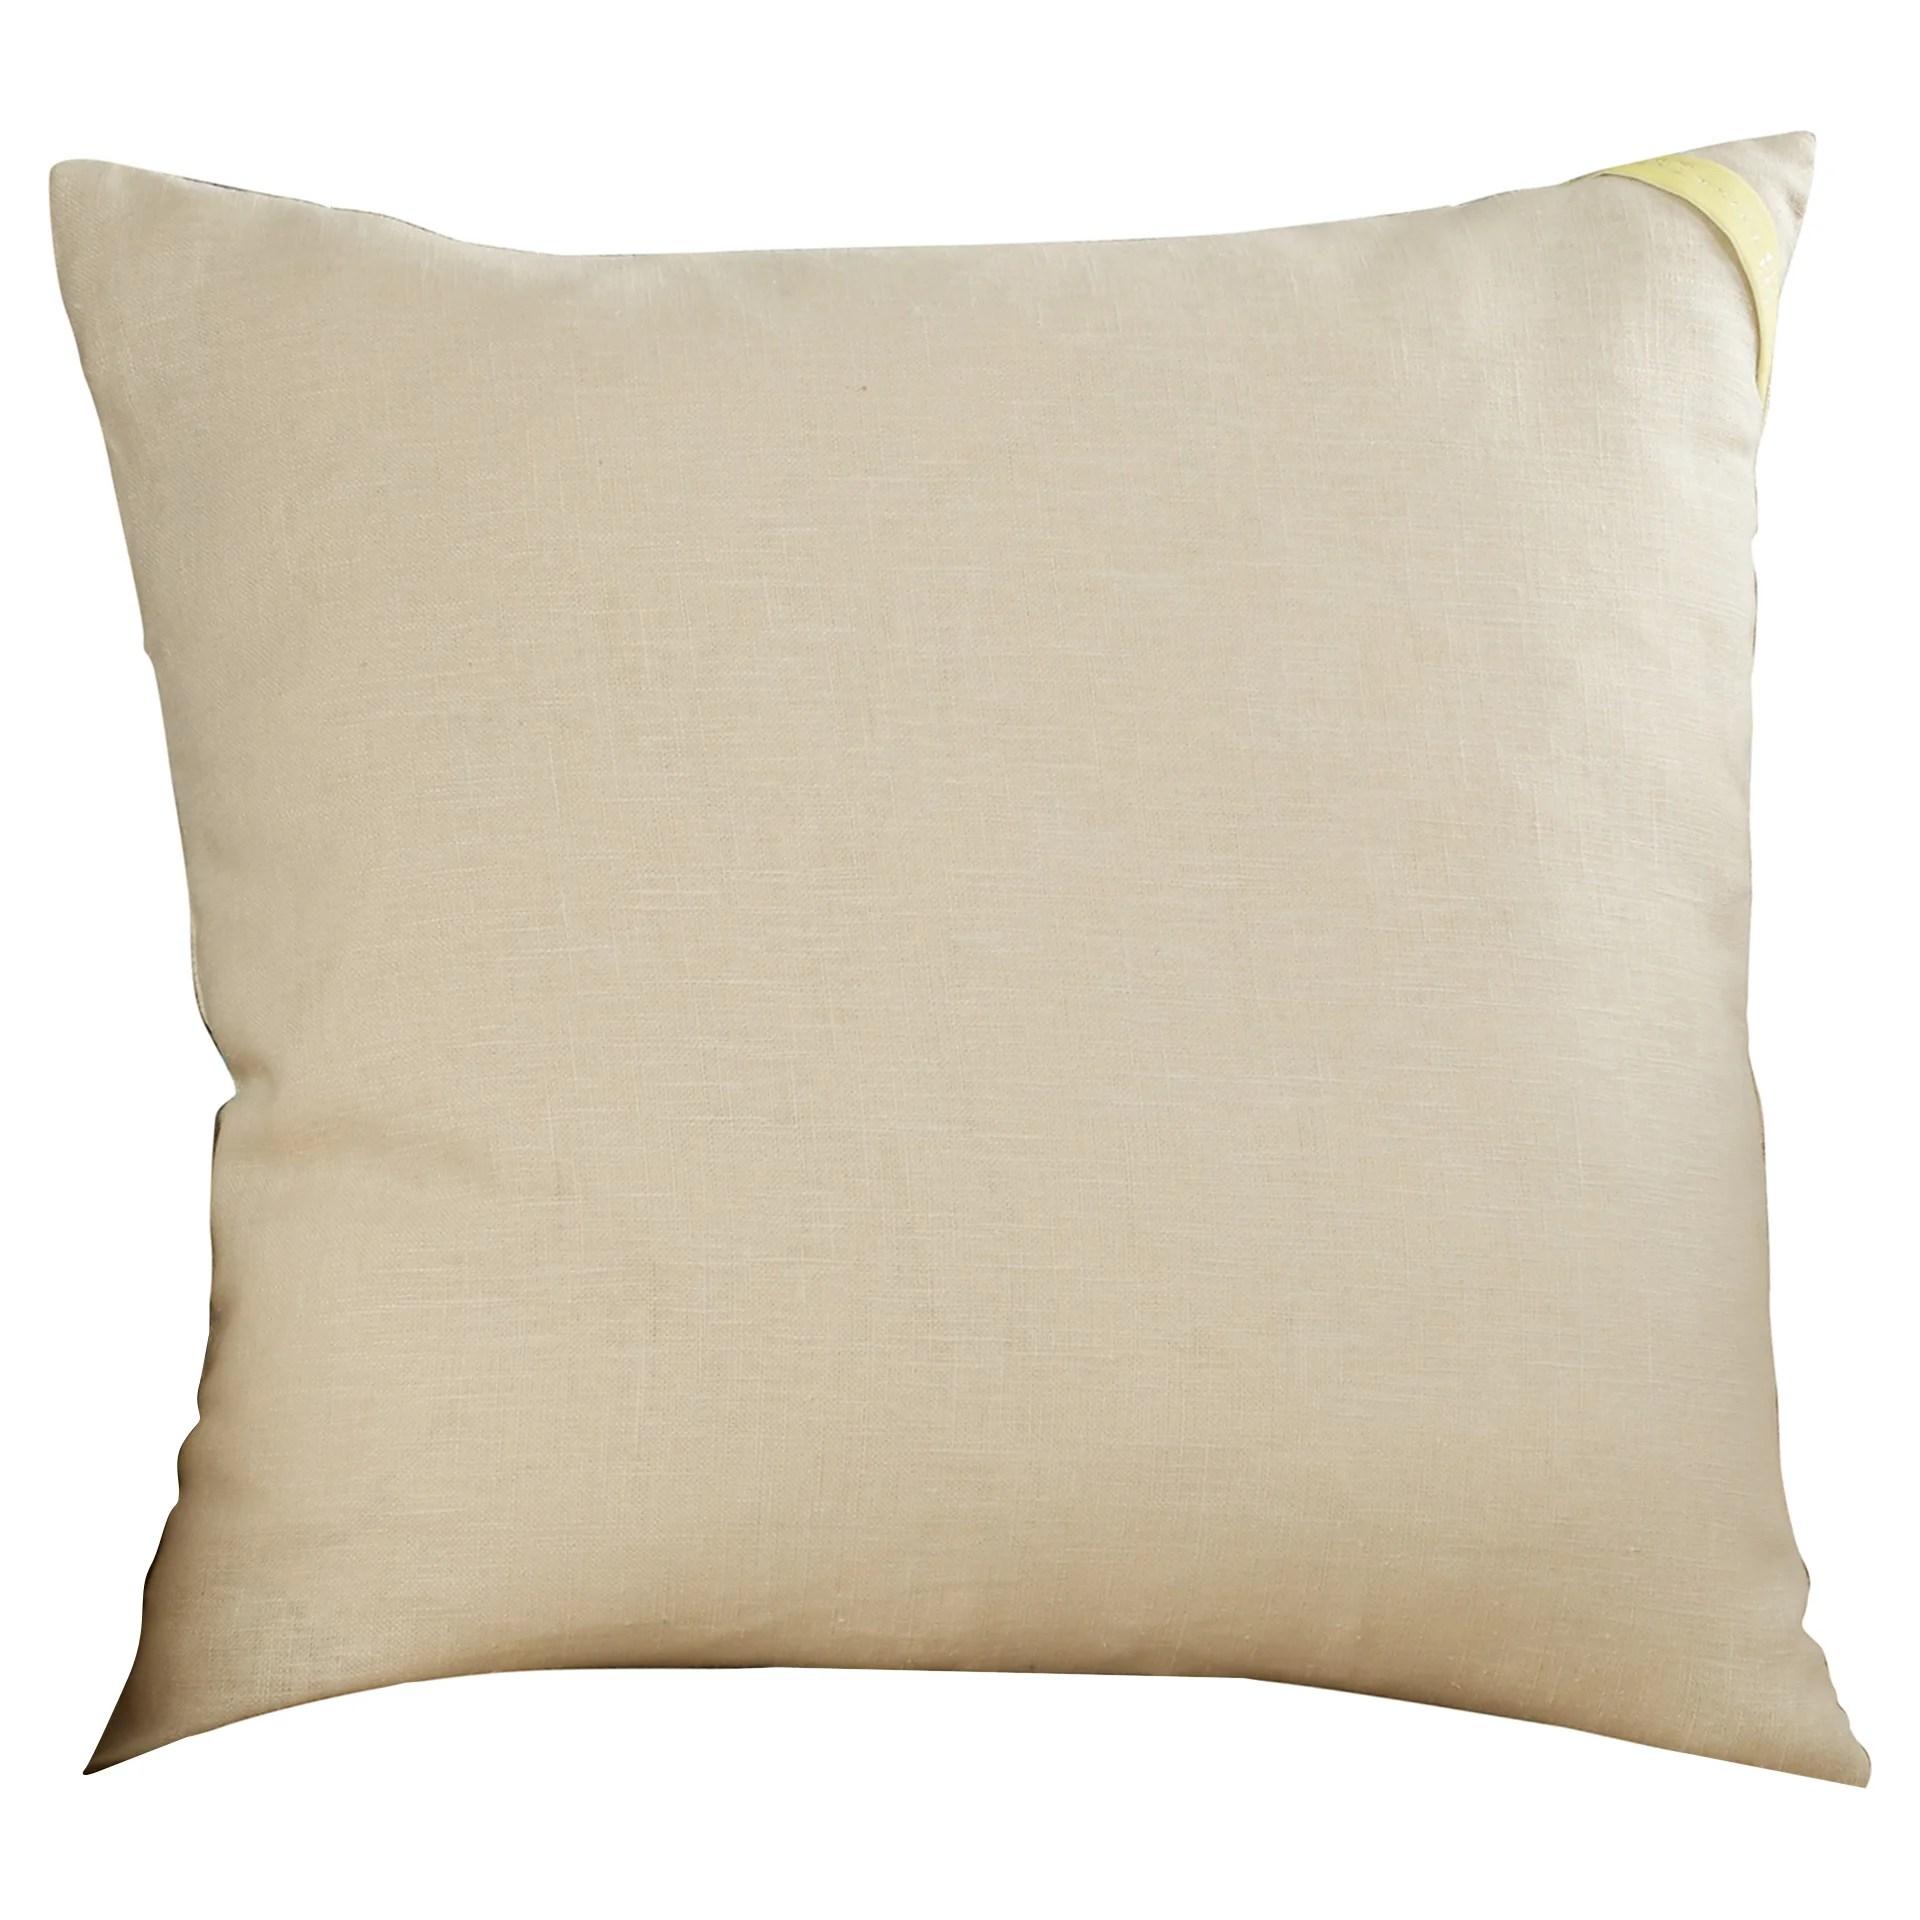 Trina Turk Residential Waterflow Linen Throw Pillow